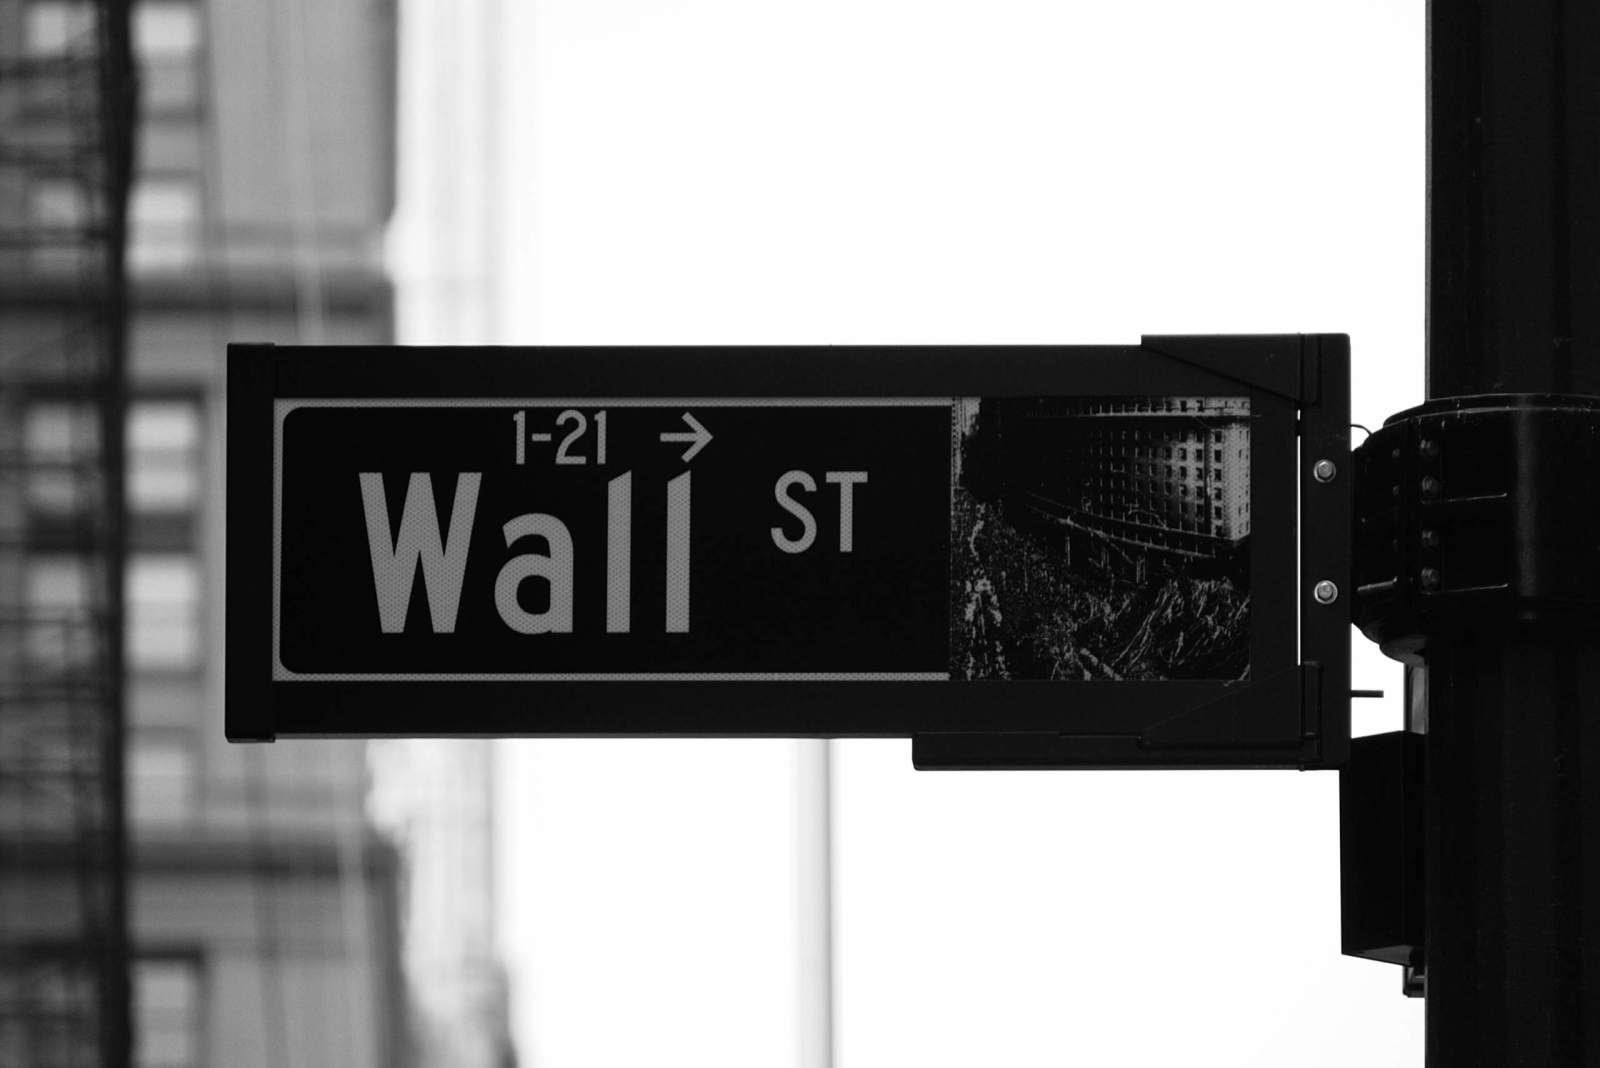 Wall Street Straßenschild